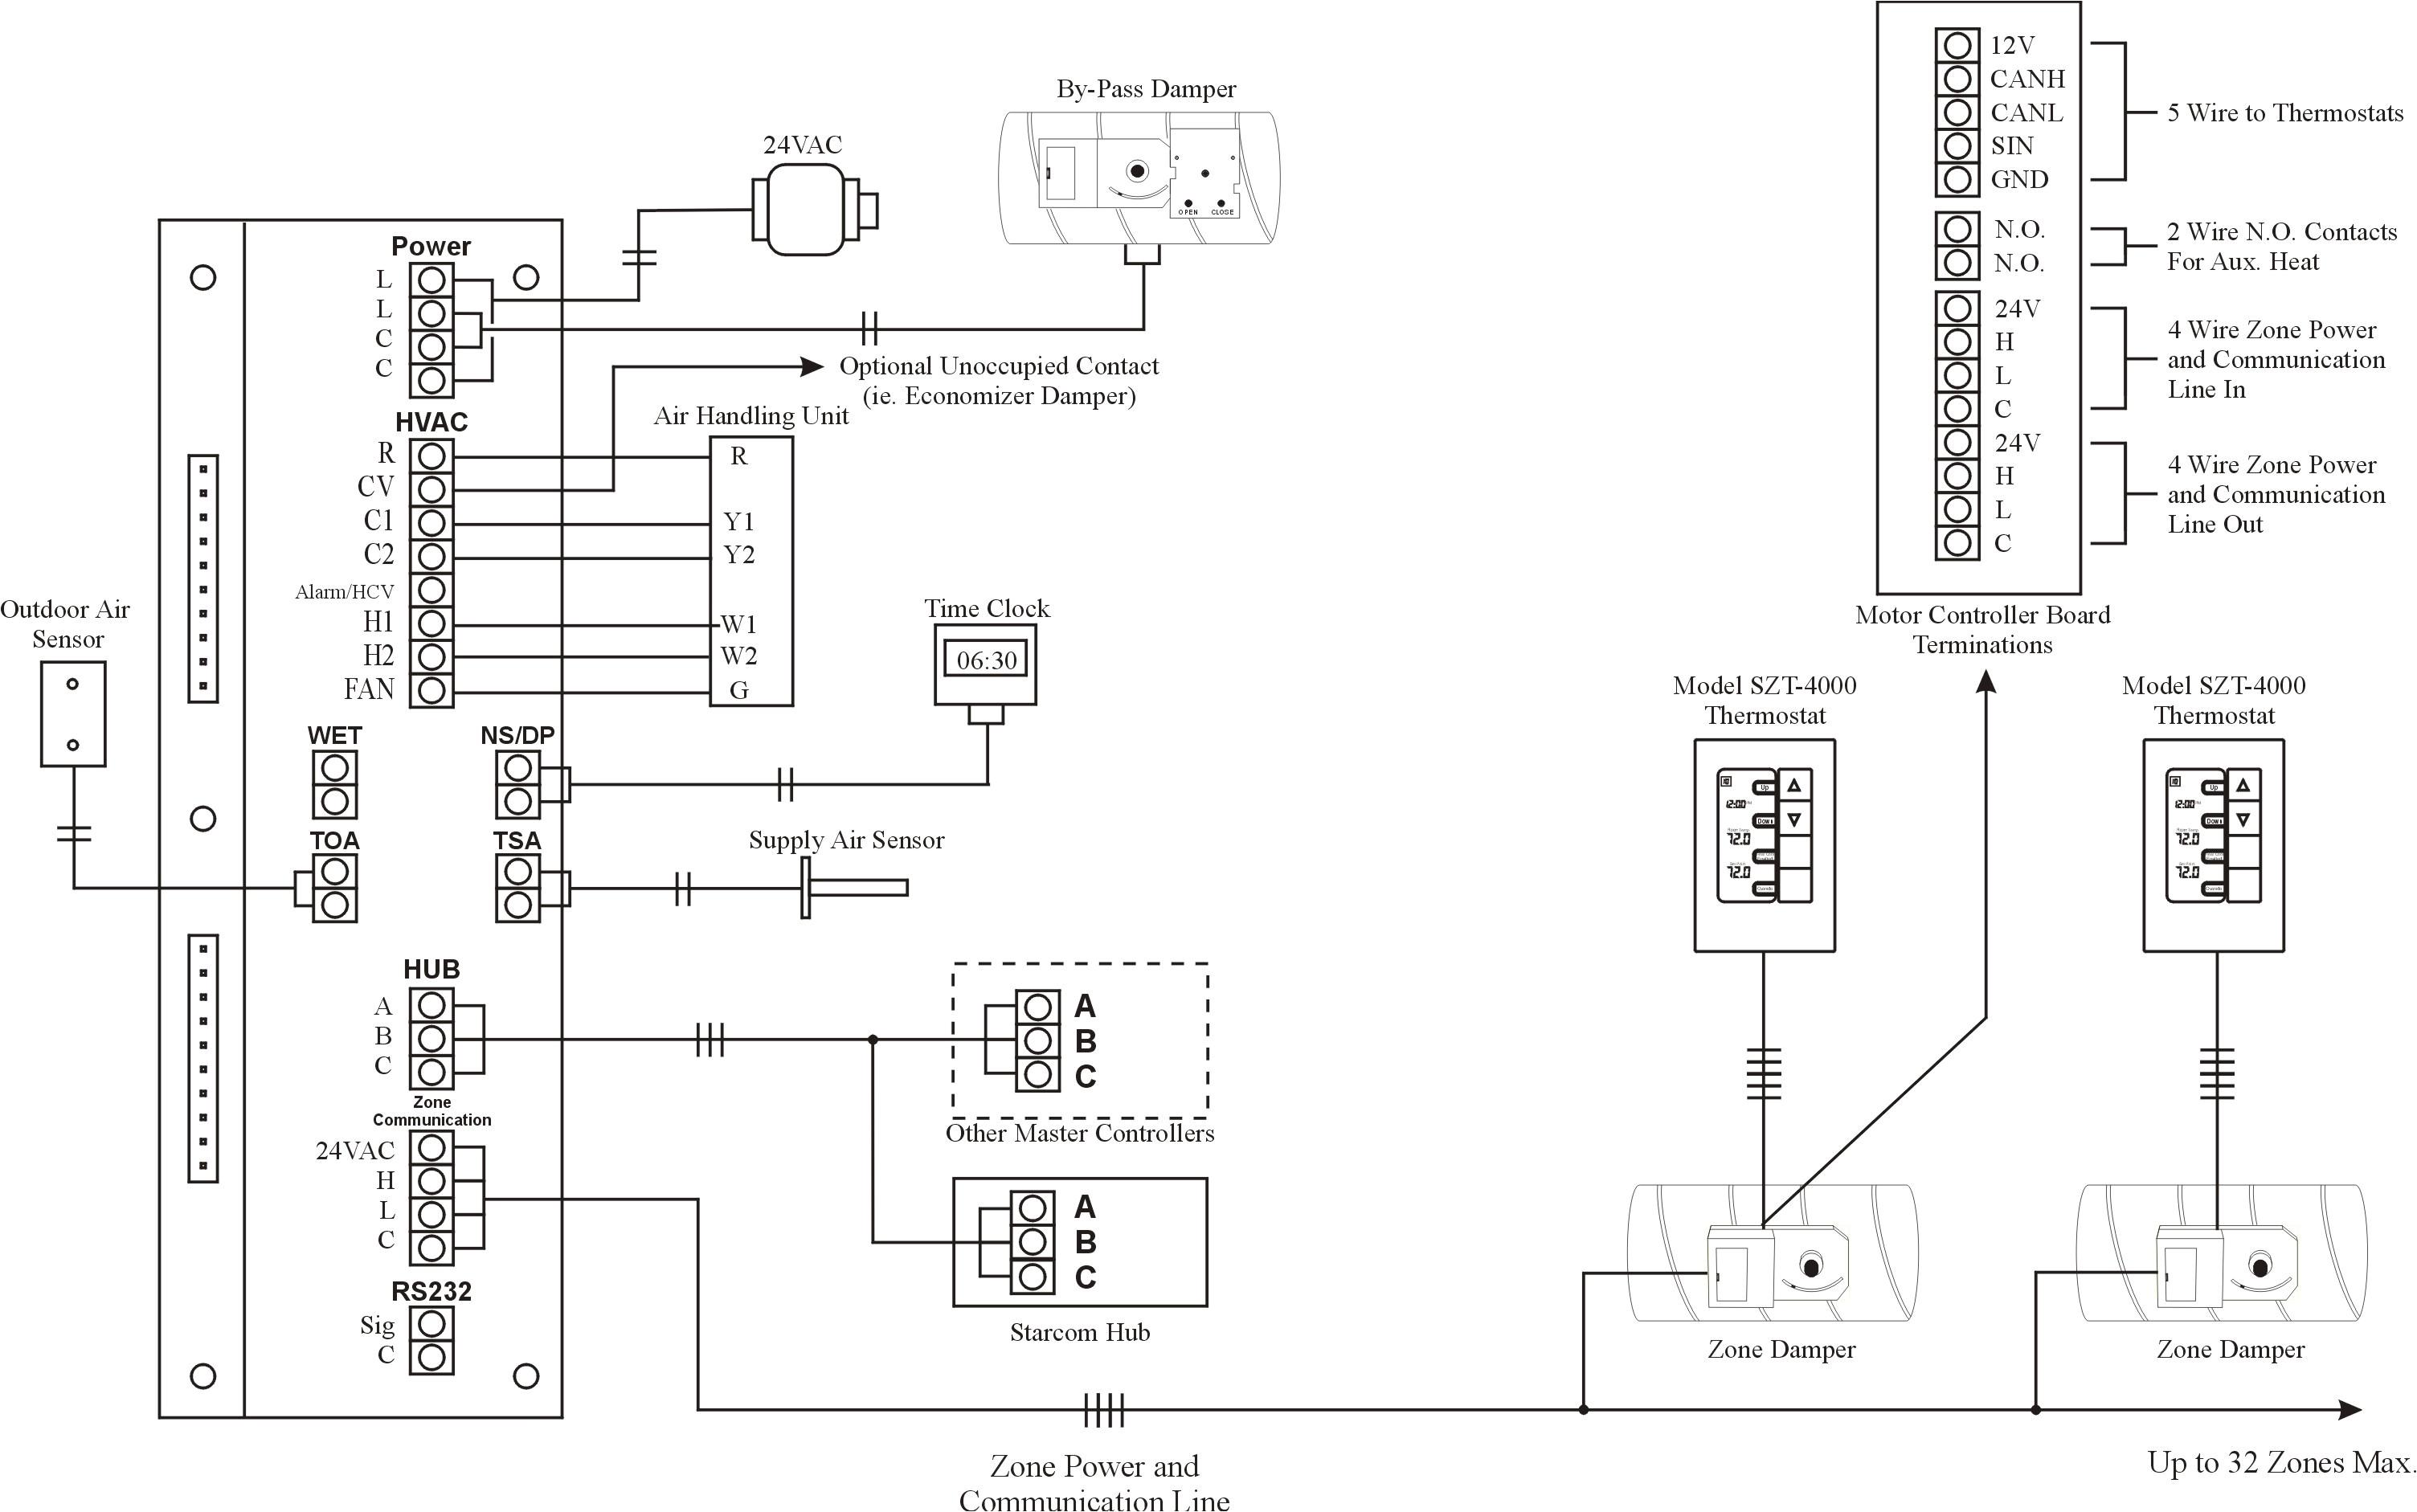 adt wiring diagram wire diagram database adt alarm system wiring diagram